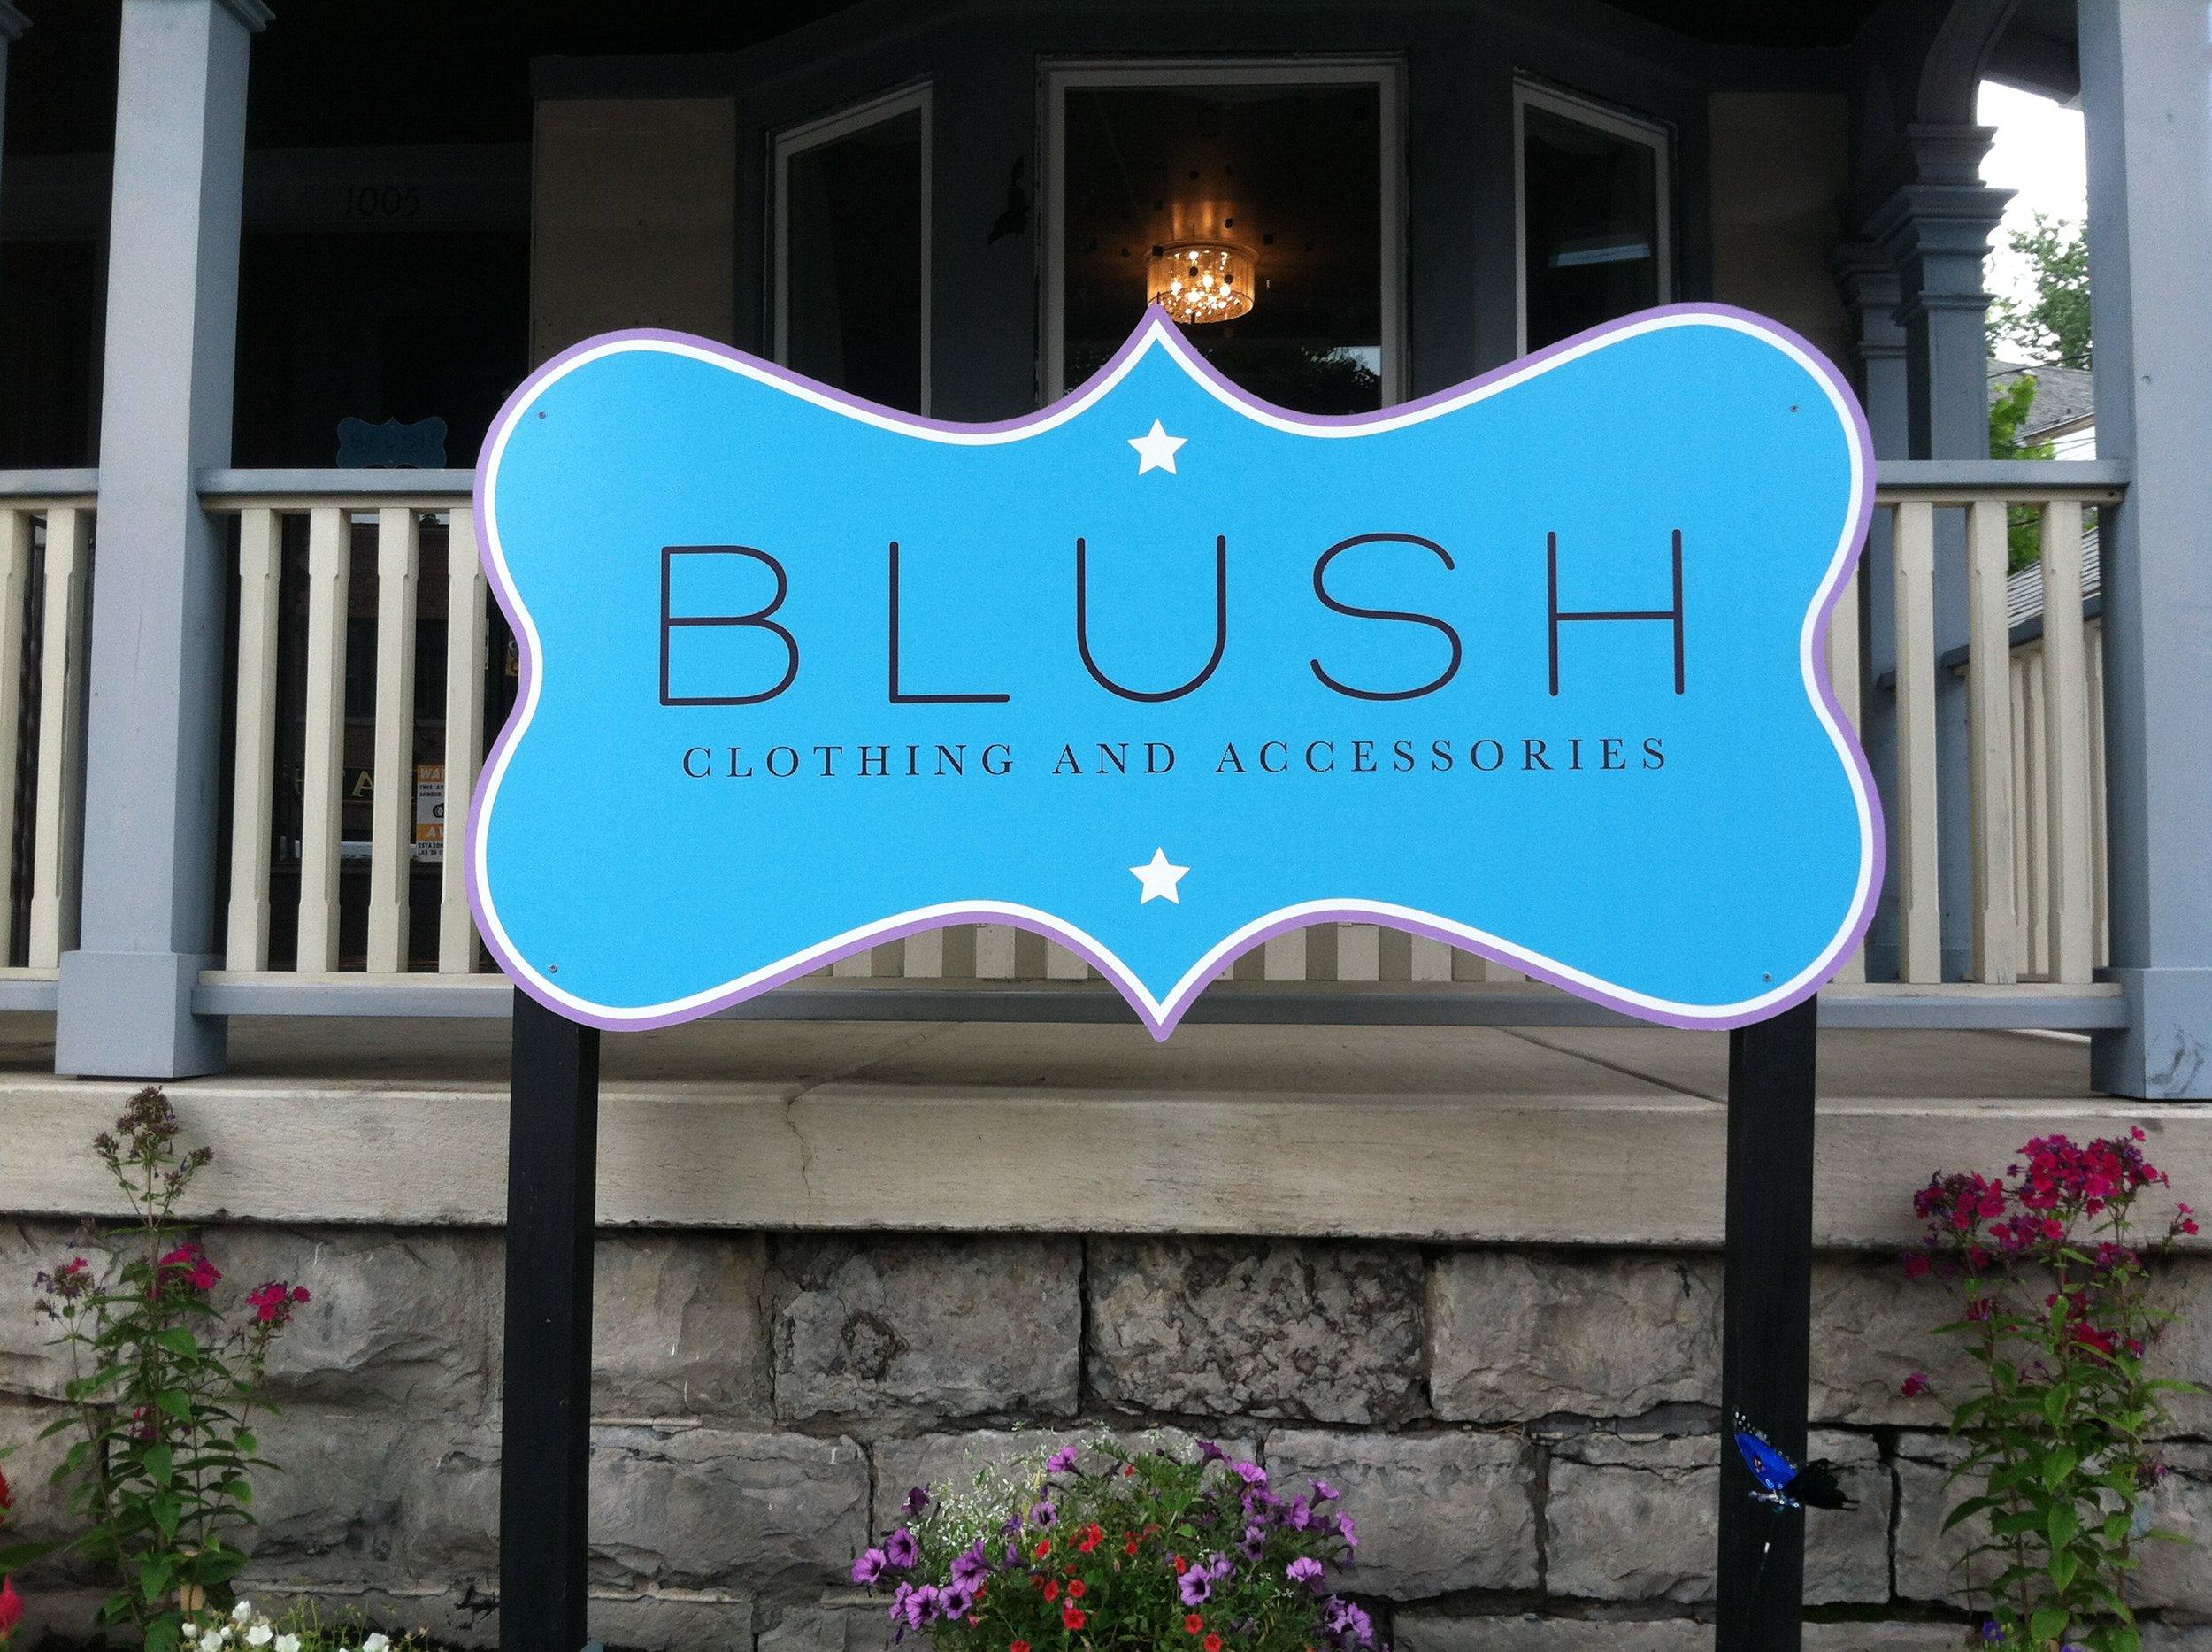 Blush 12